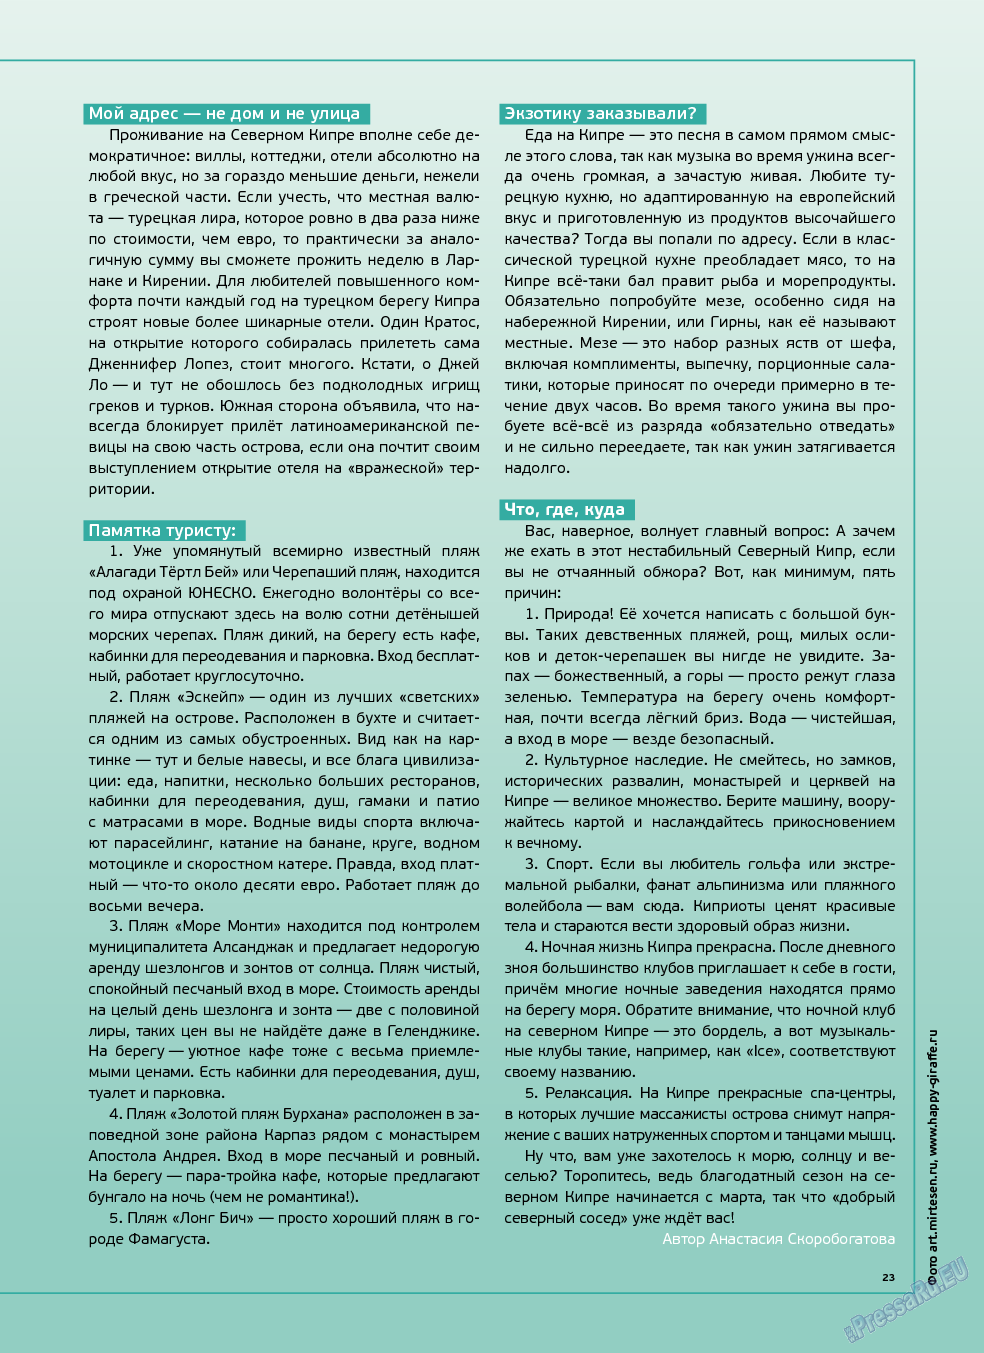 Артек (журнал). 2013 год, номер 2, стр. 25